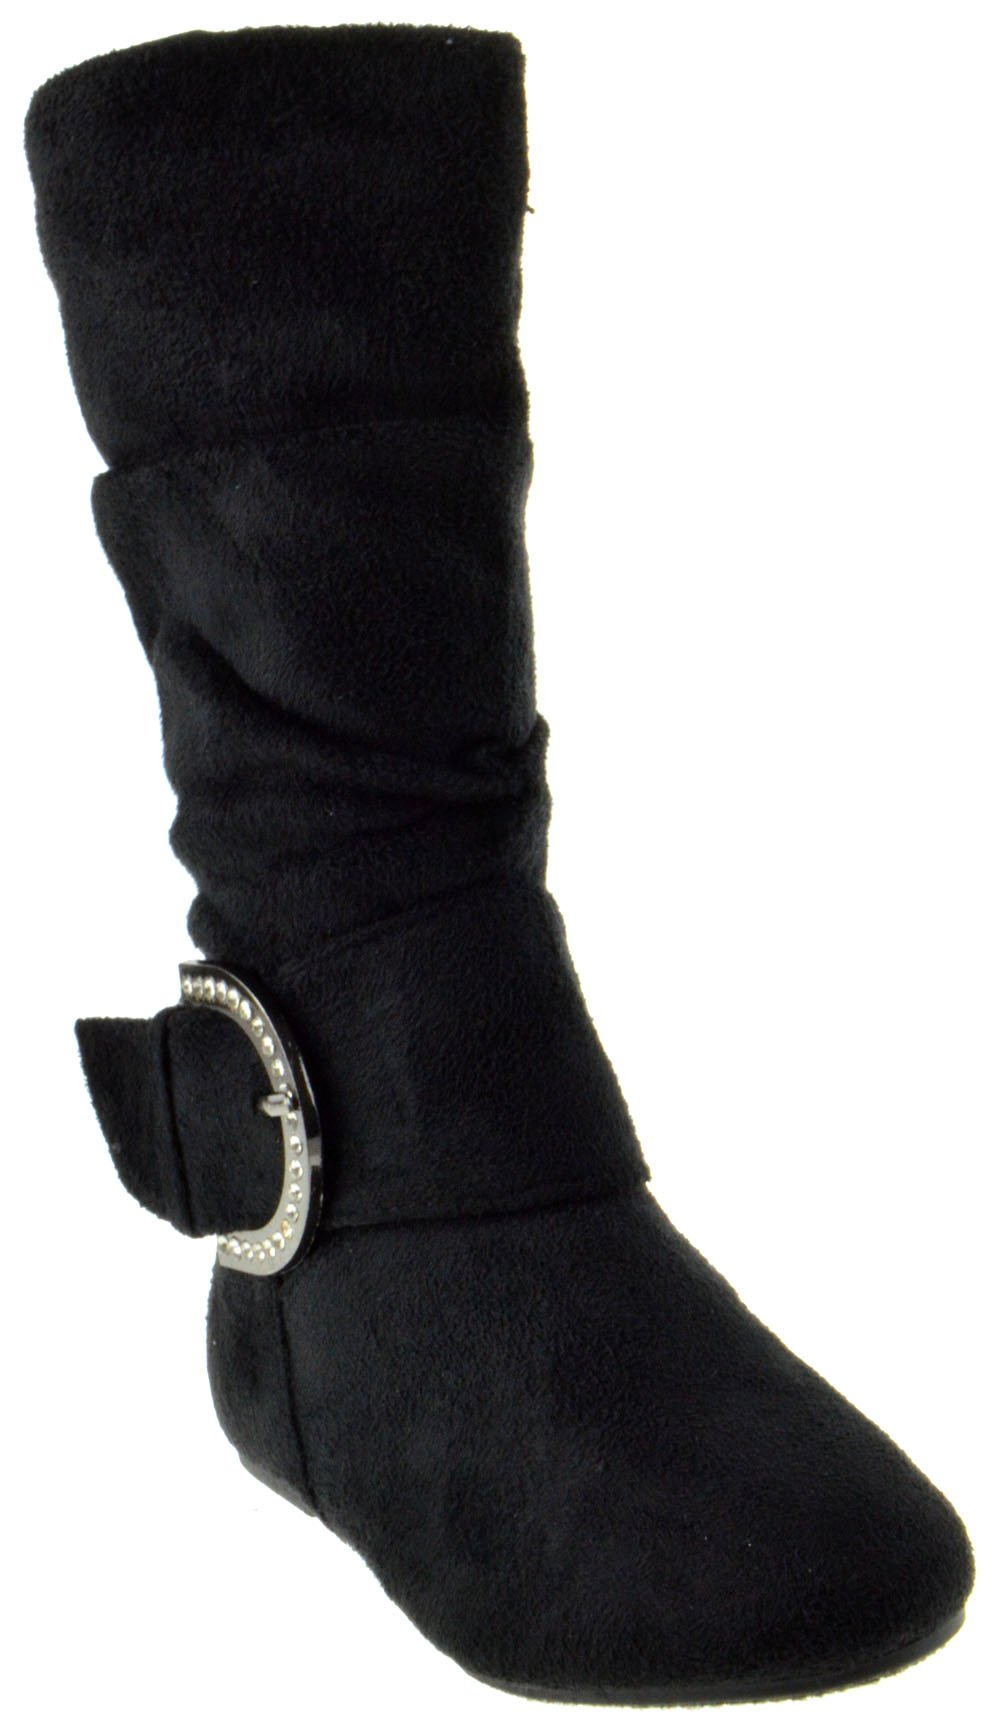 Bella 66 Little Girls Slouch Mid Calf Boots Black 7